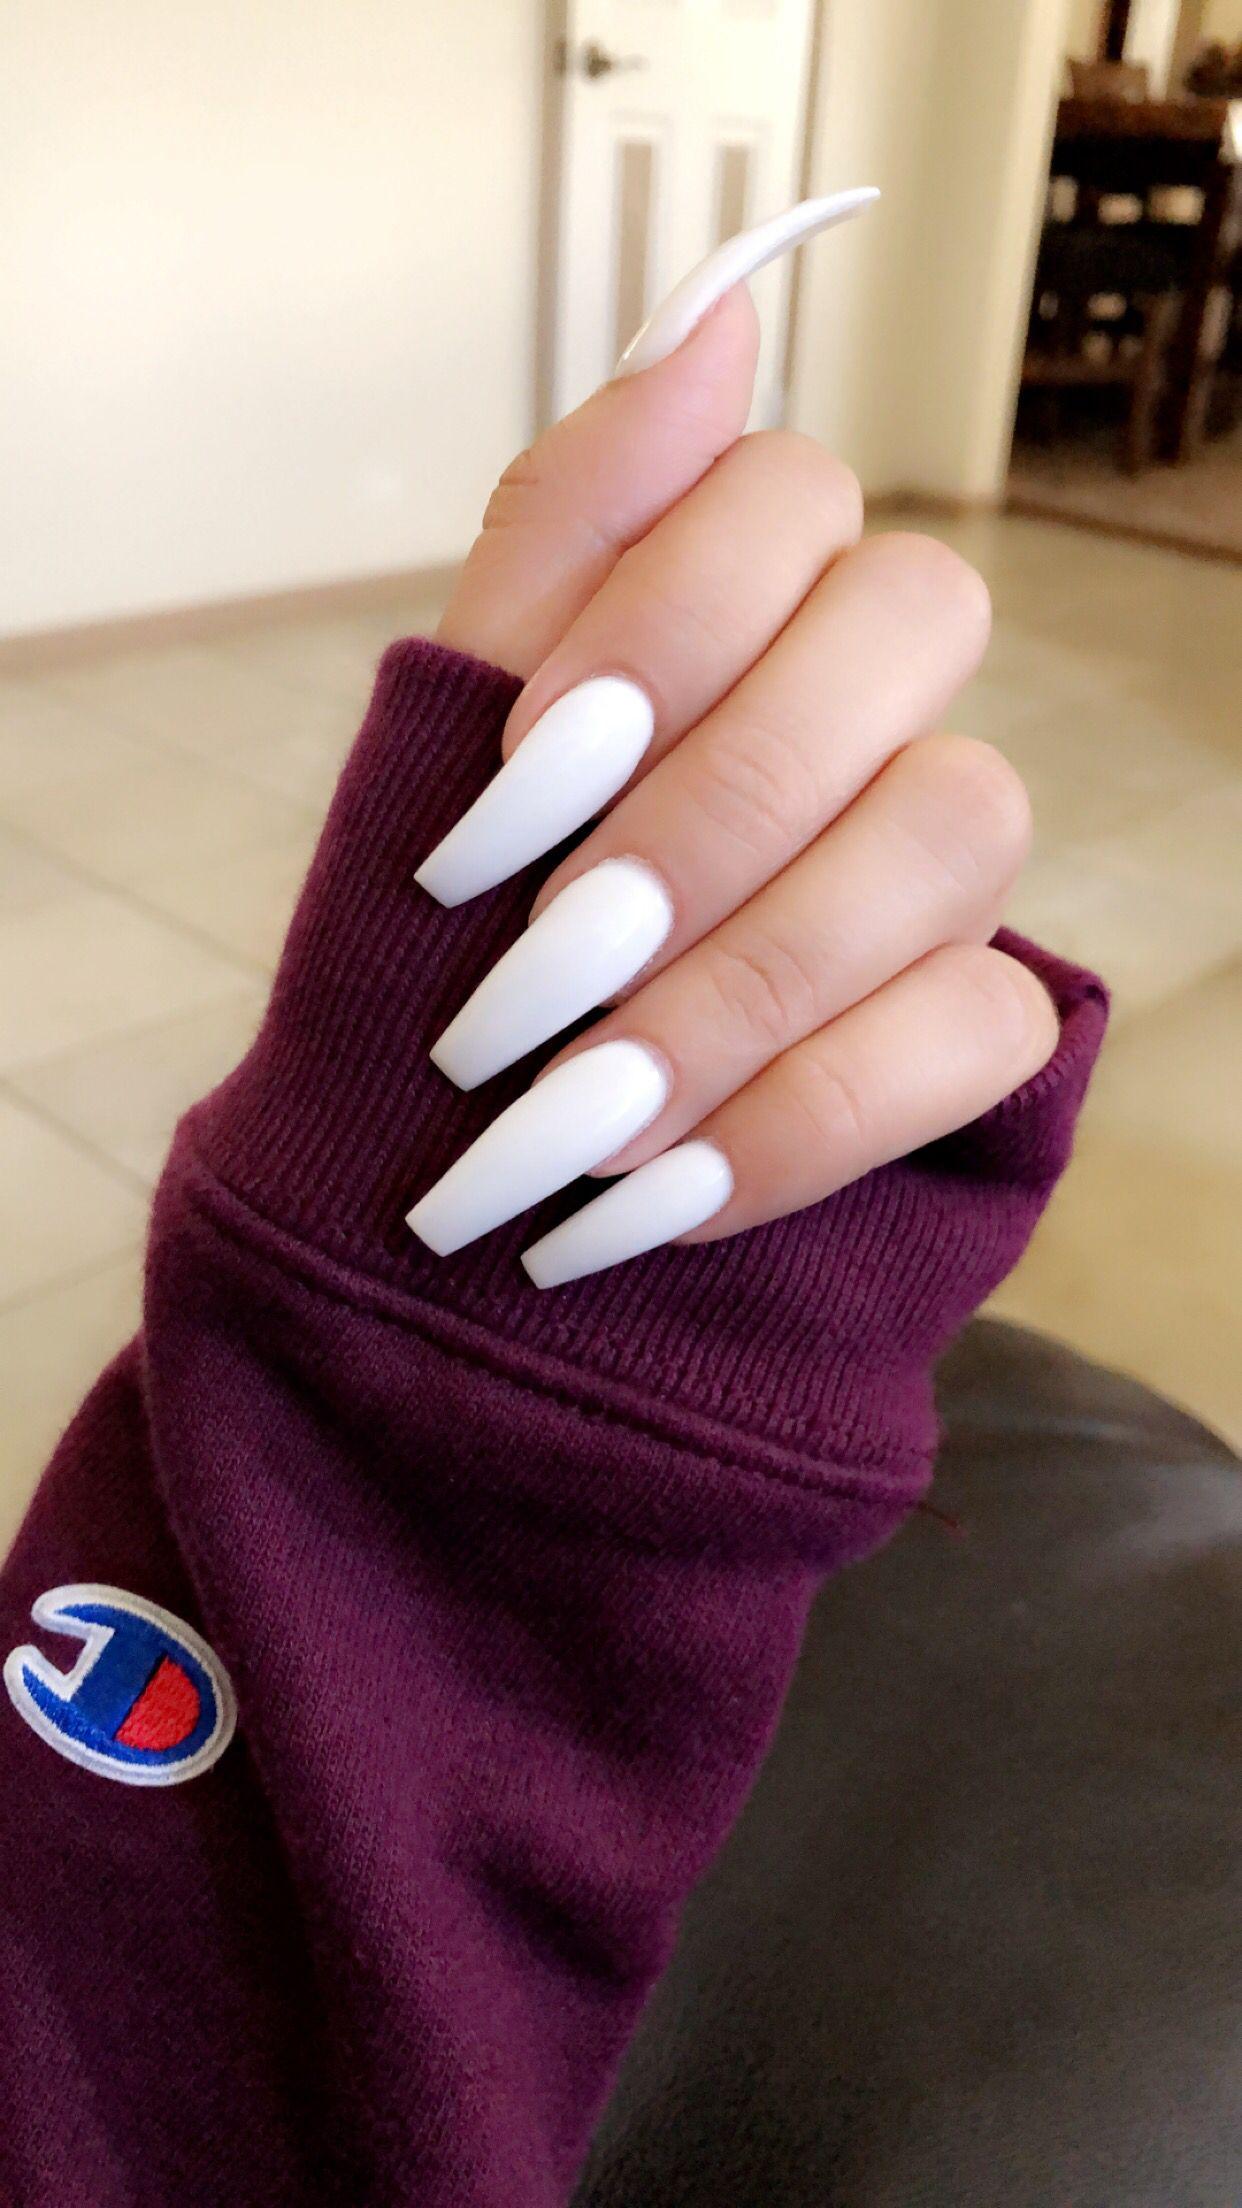 White Acrylic Nails Simple Acrylic Nails Best Acrylic Nails White Acrylic Nails